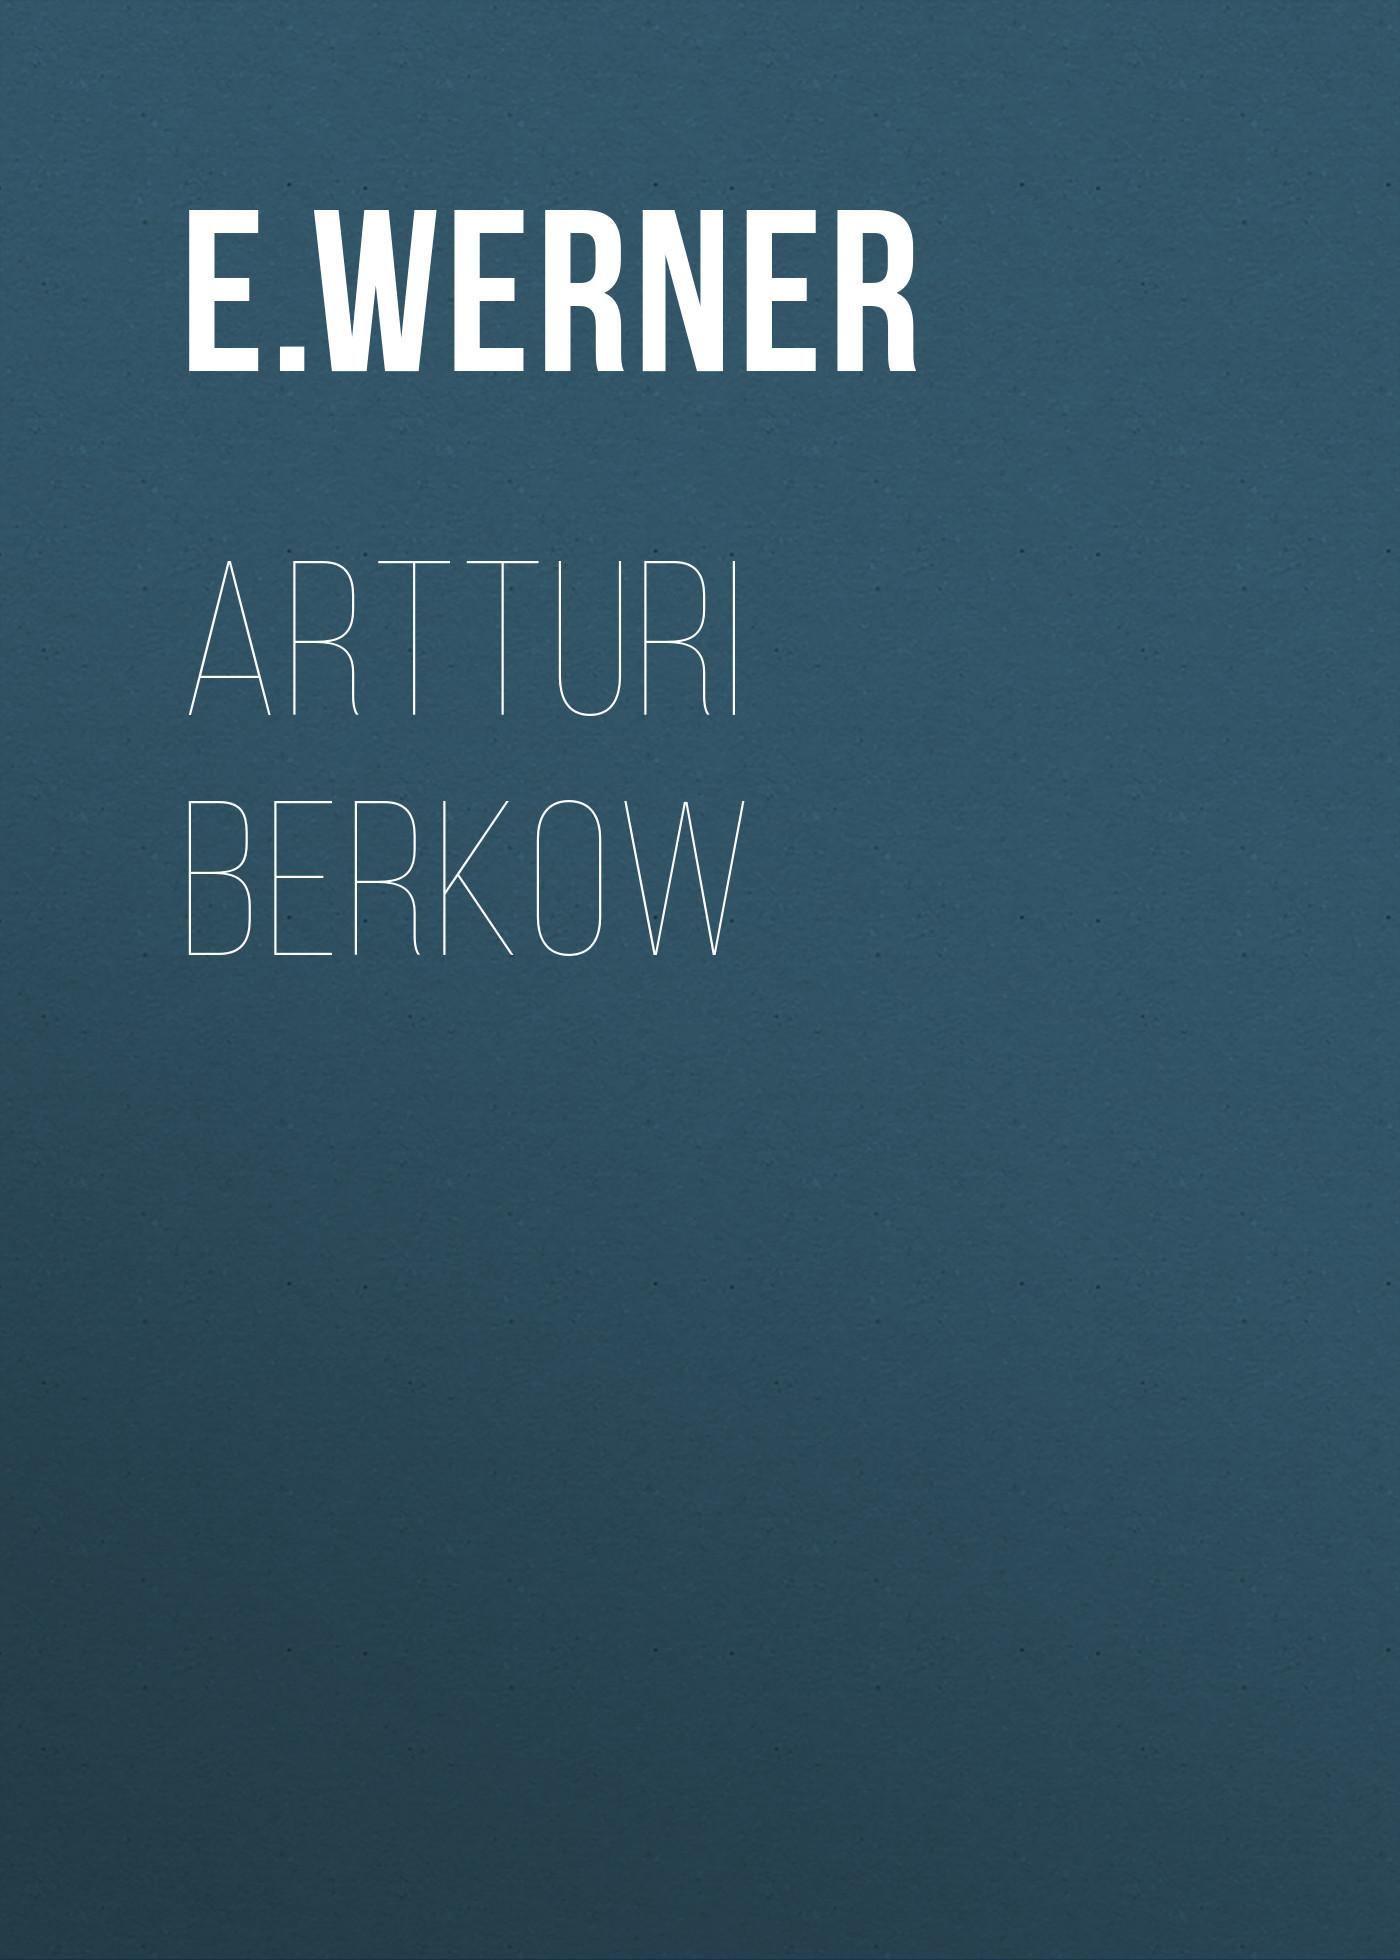 E. Werner Artturi Berkow автополироль meguiar s g 12718